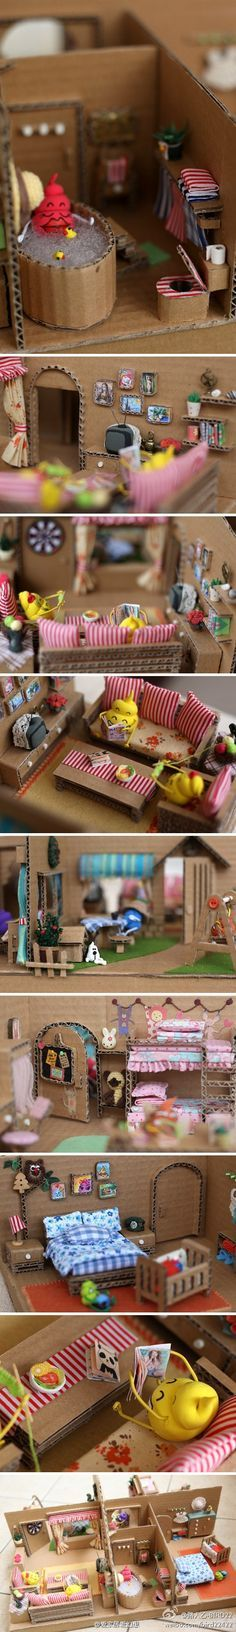 Little dream house.